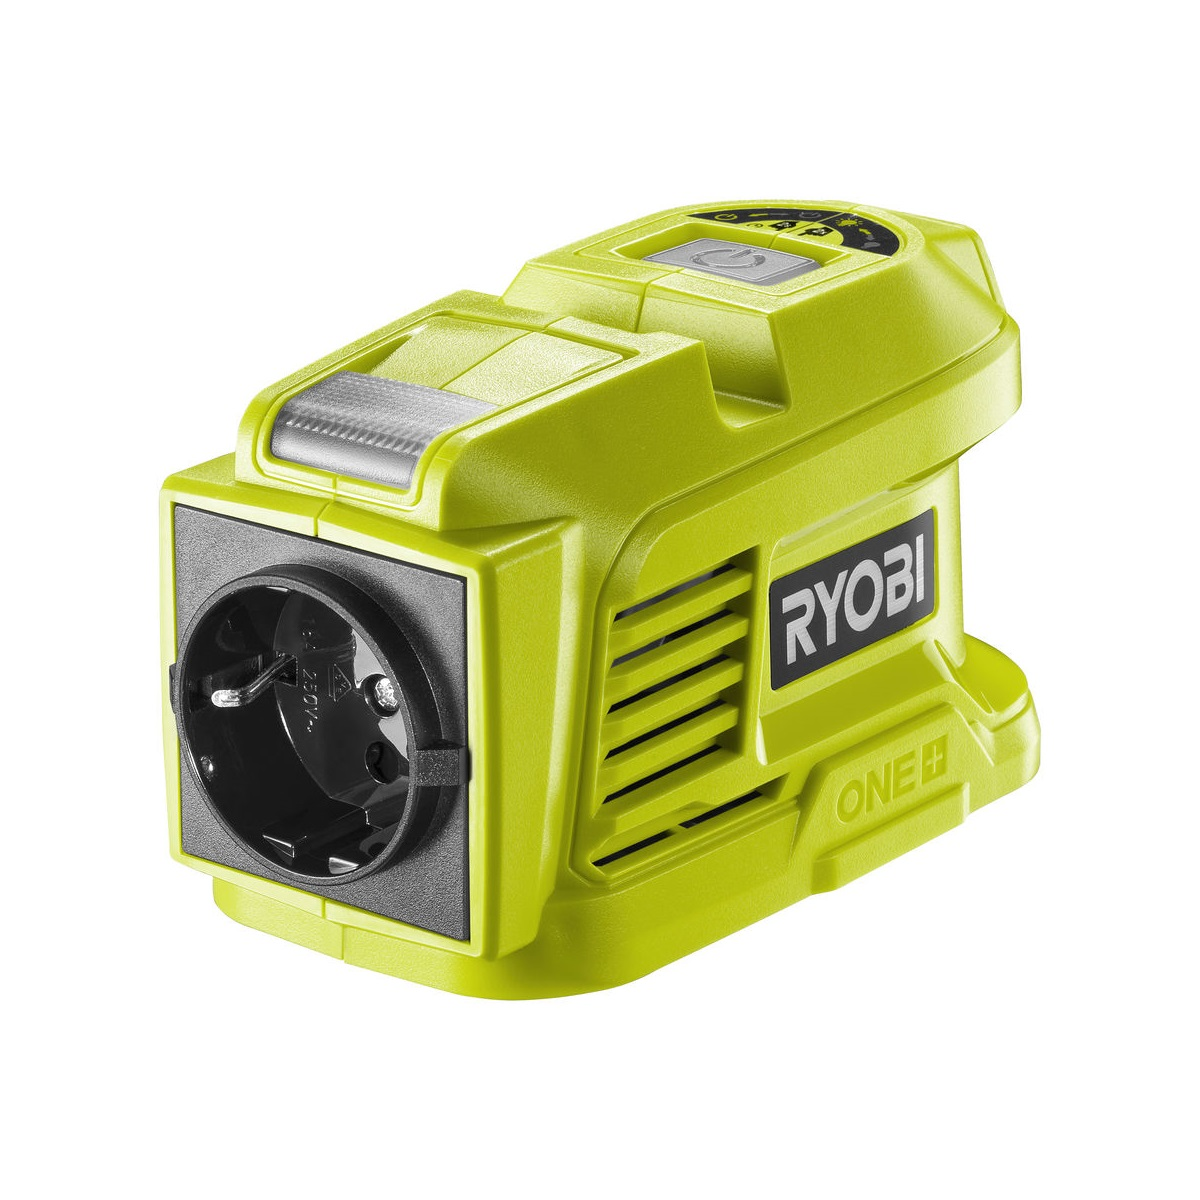 Ryobi RY18BI150A-0aku měnič napětí (bez baterie a nabíječky)